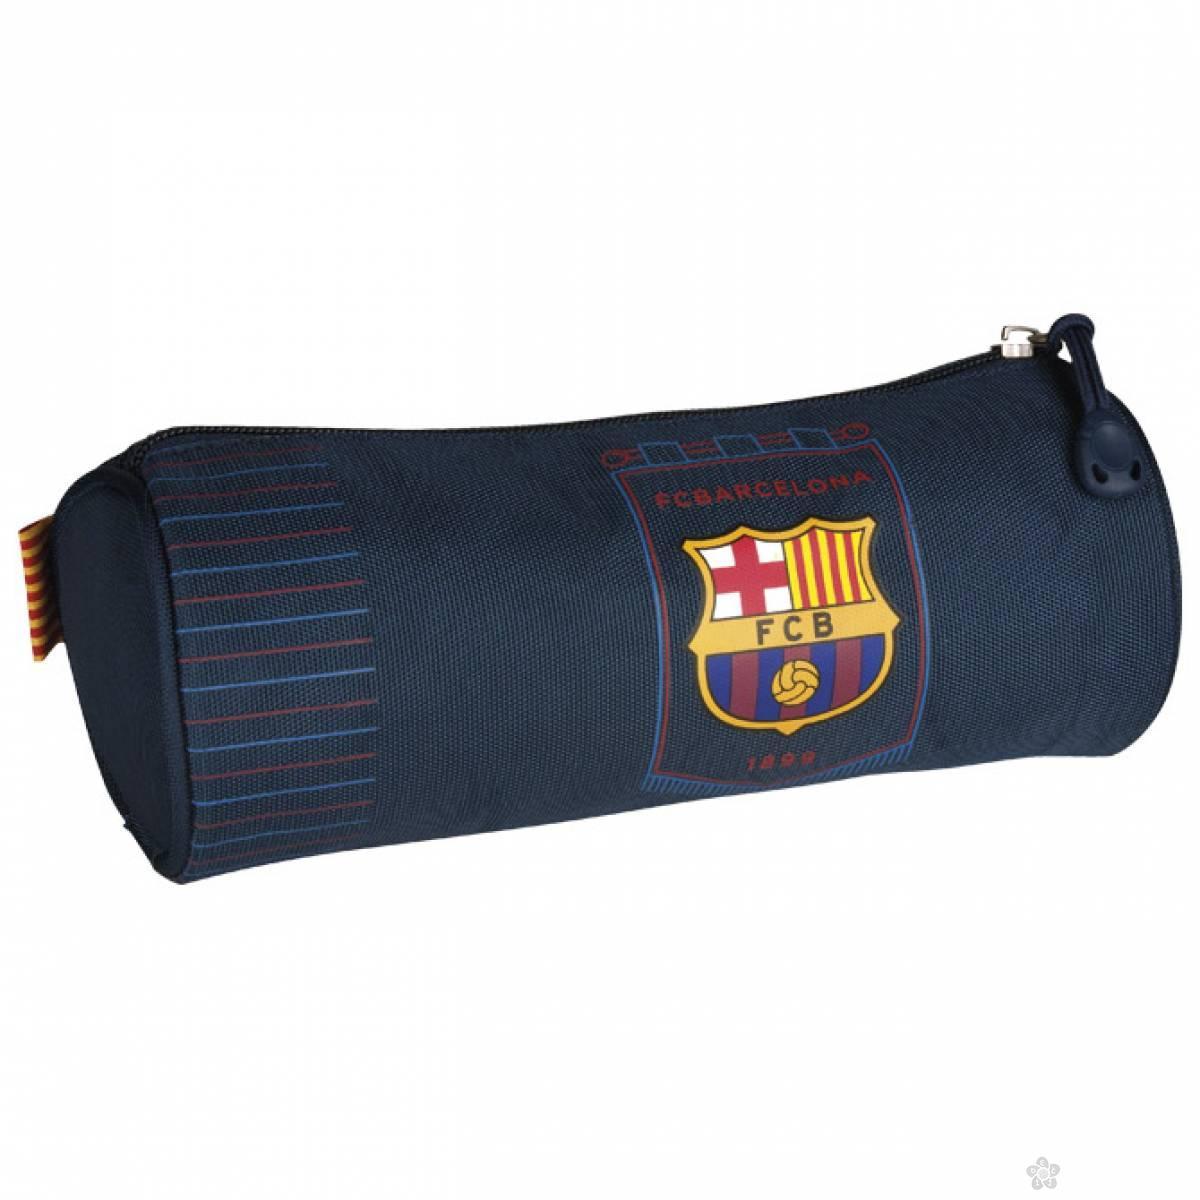 Okrugla pernica FC Barcelona 1 zip Astra 505016003